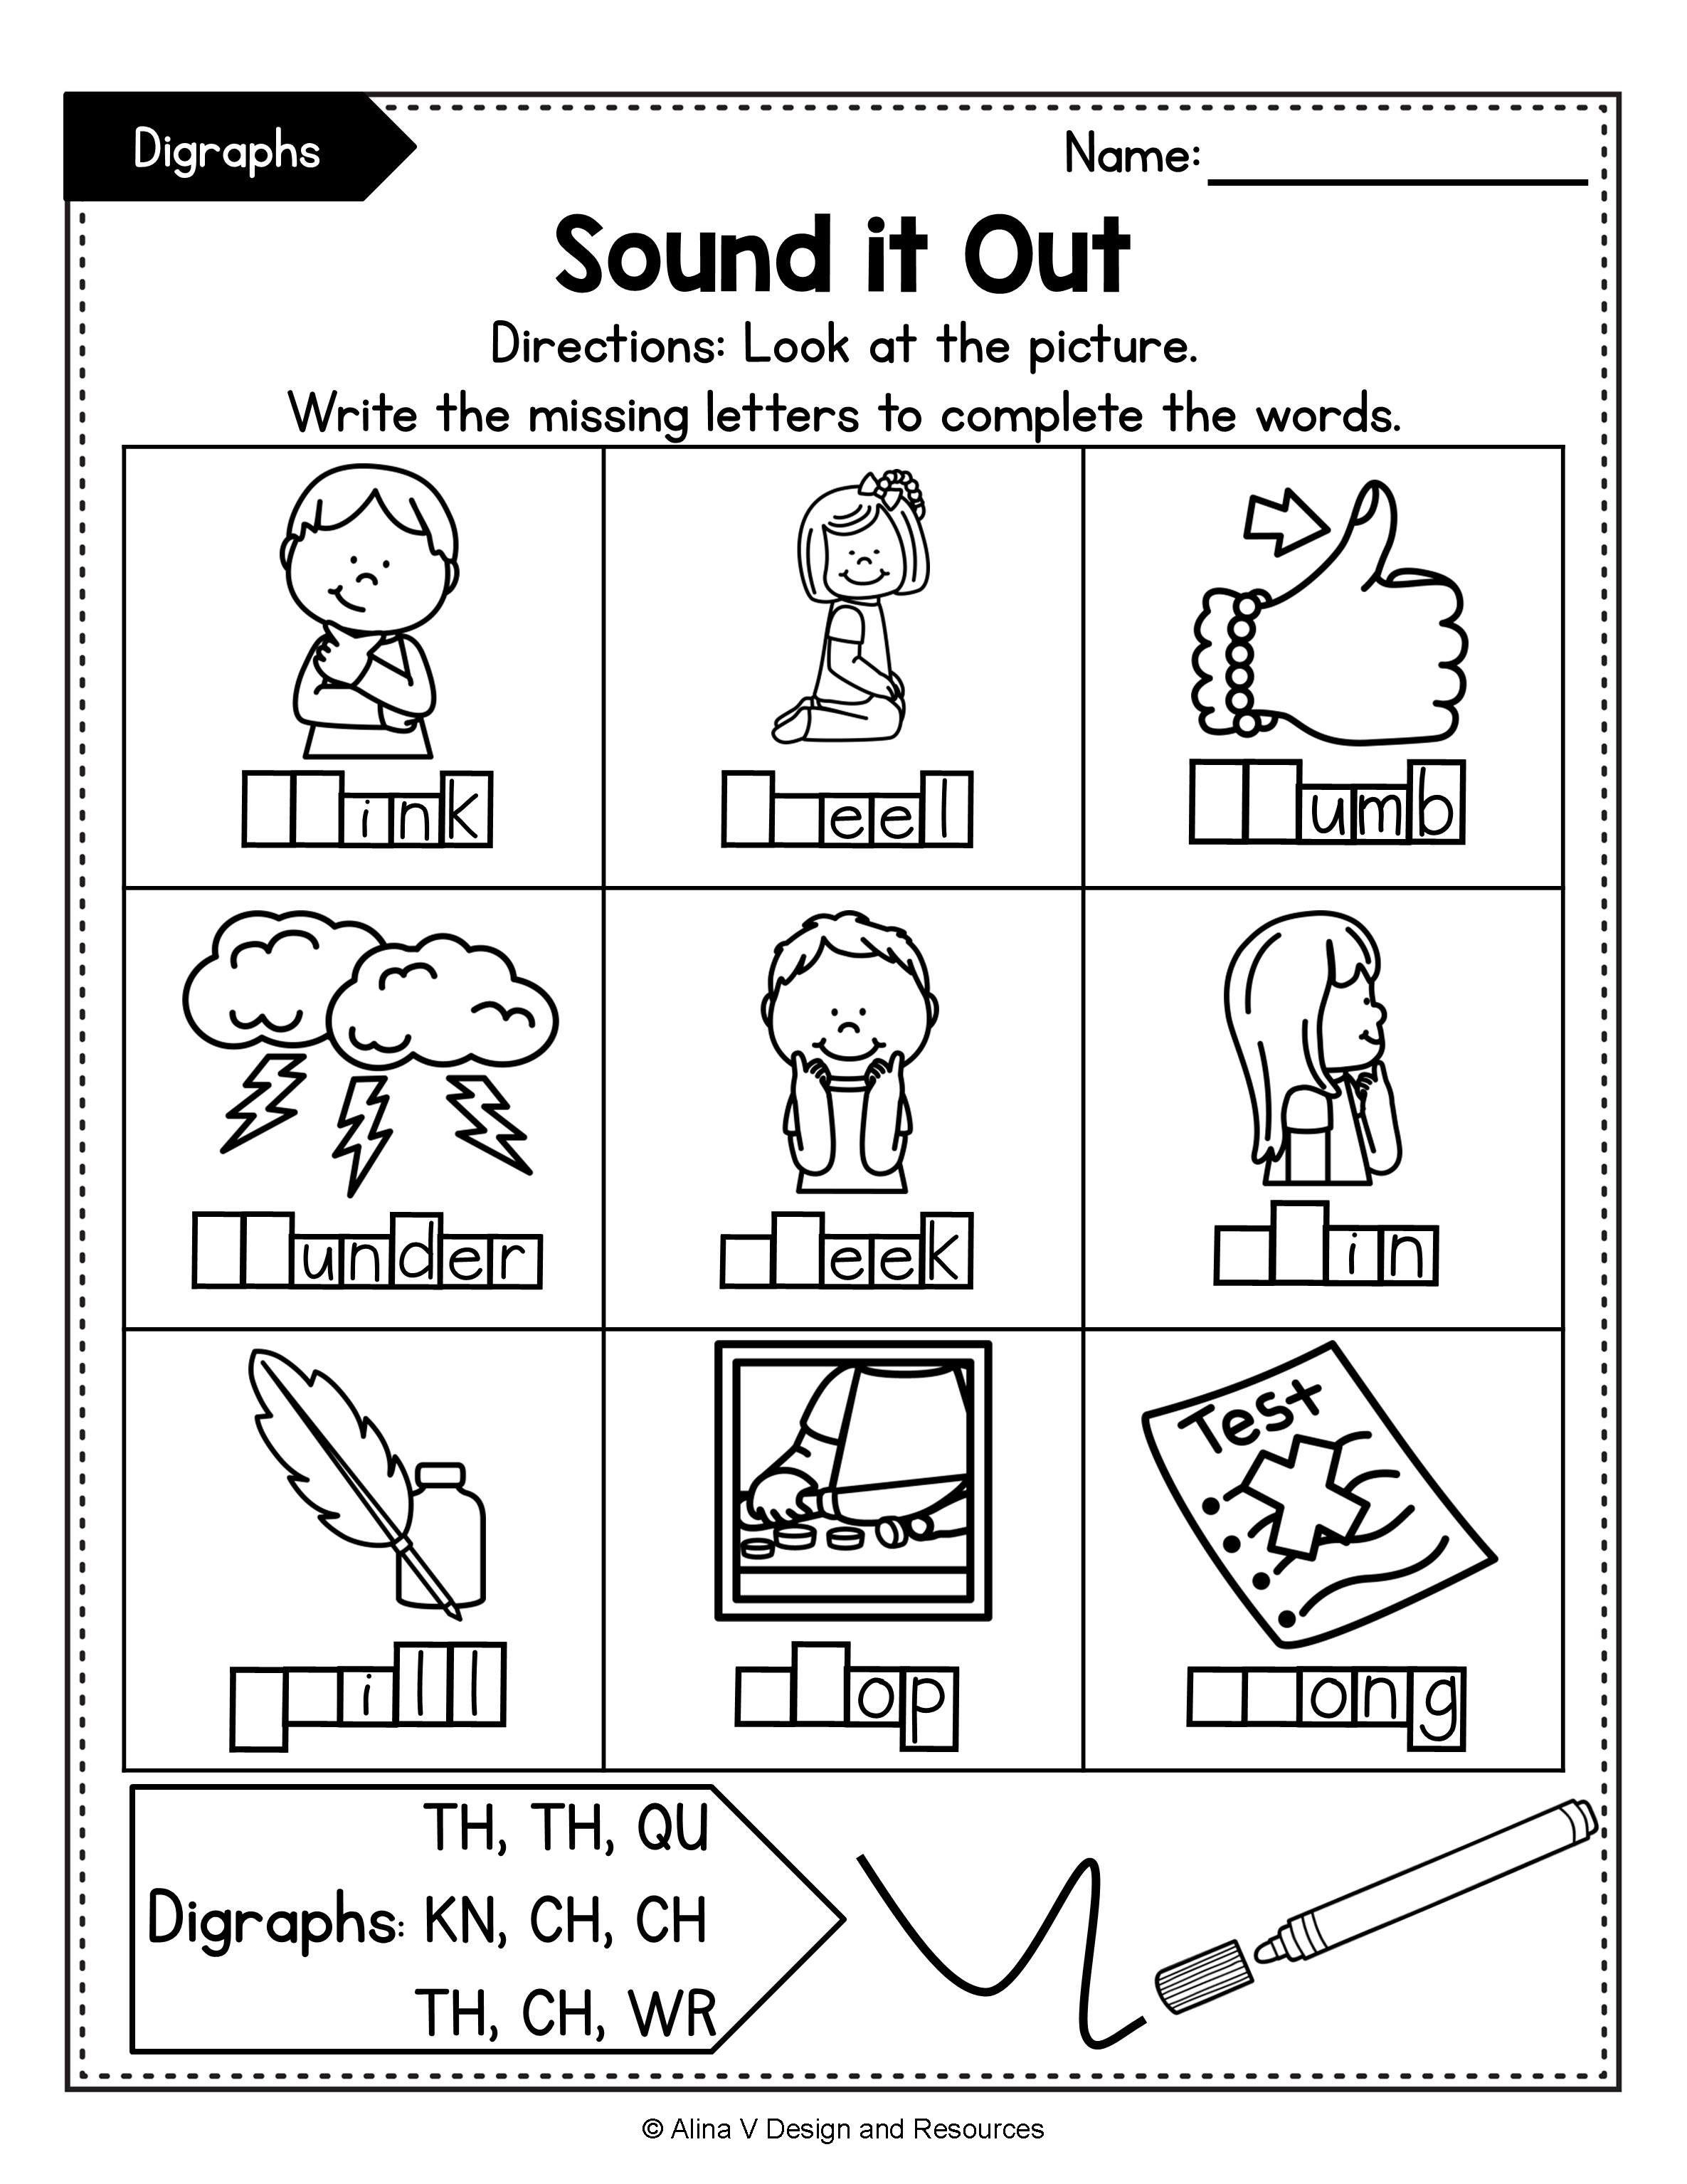 Consonant Digraphs Worksheets Sh Ch Th Wh Ph Kn Wr Qu Mega Bundle In 2020 Phonics Activities Digraph Phonics Kindergarten